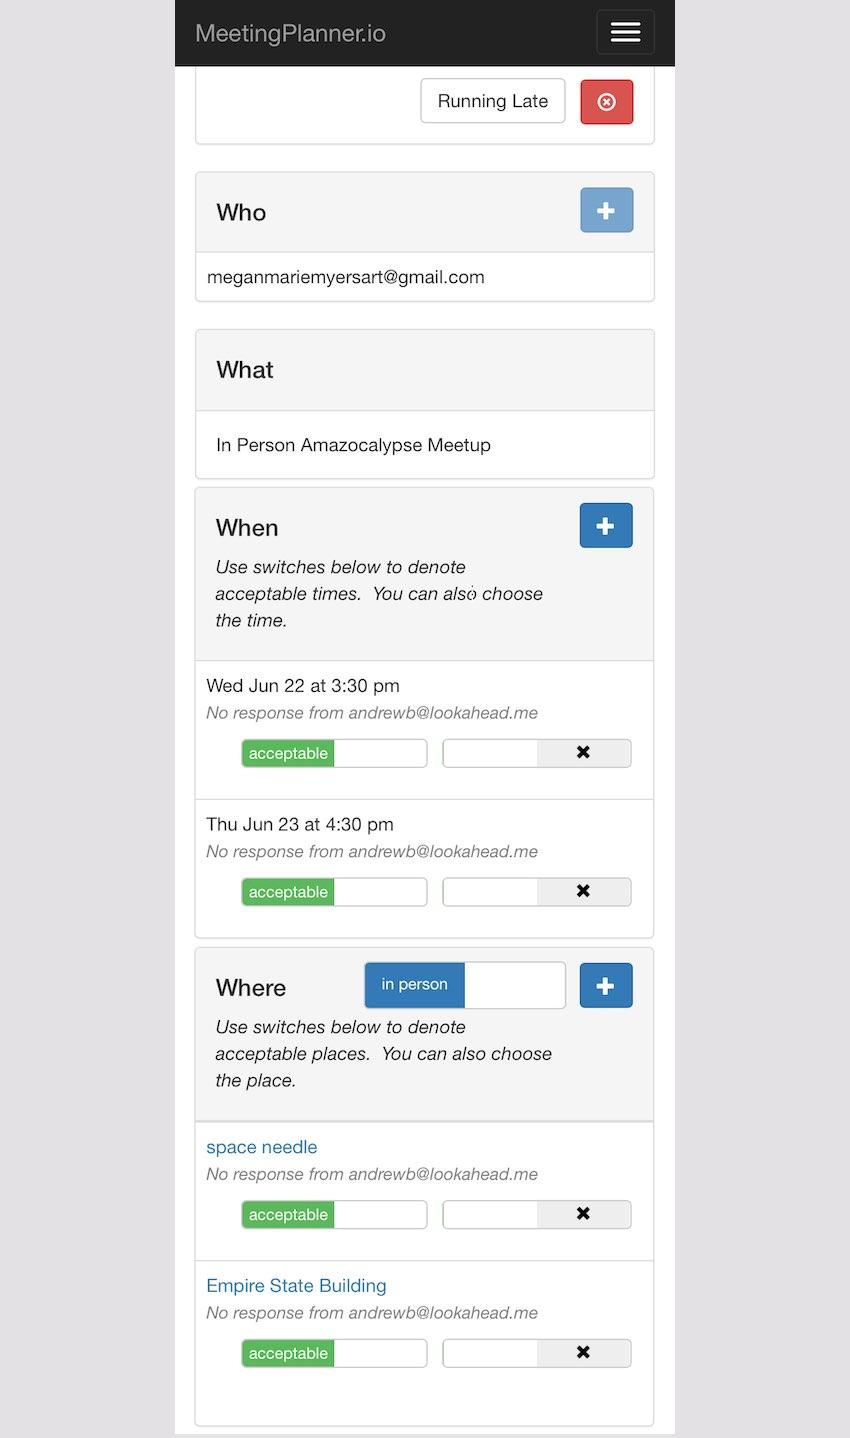 Meeting Planner Responsive Web - Final Responsive Meeting Planning Form